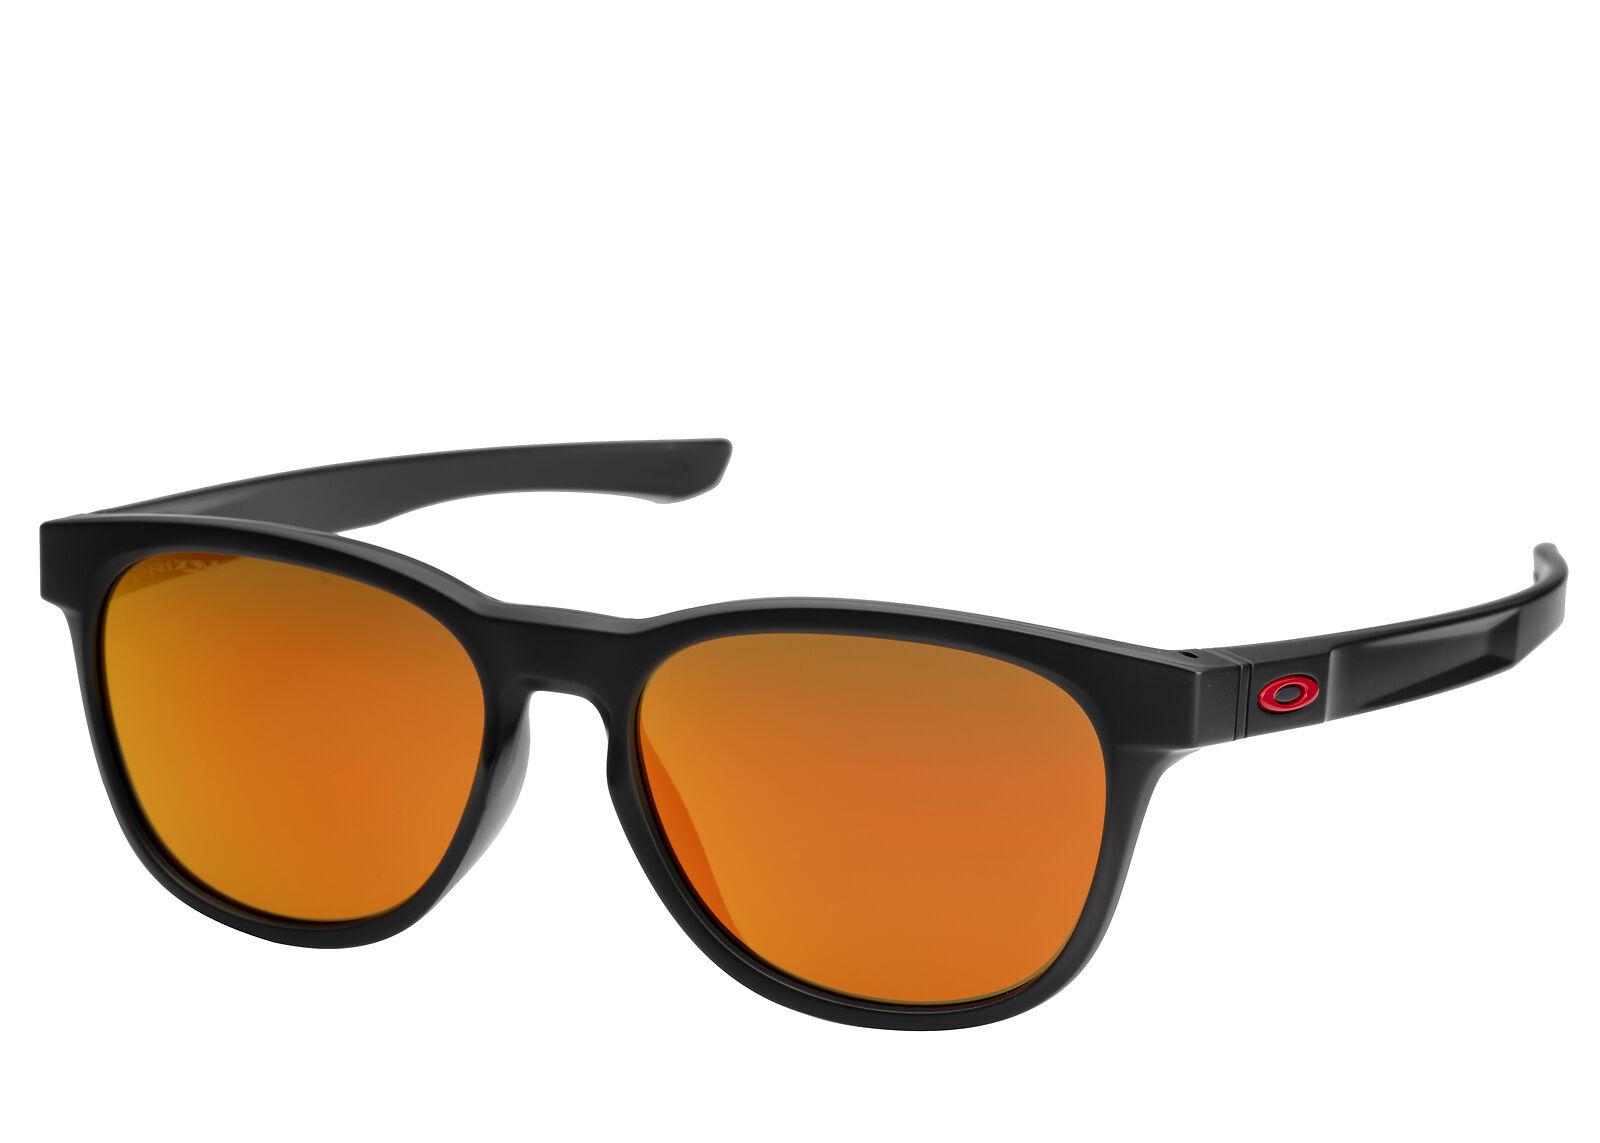 8f9075c53fd68 Oakley Stringer Sunglasses Matte Black Frame PRIZM Ruby Lens OO9315-1655